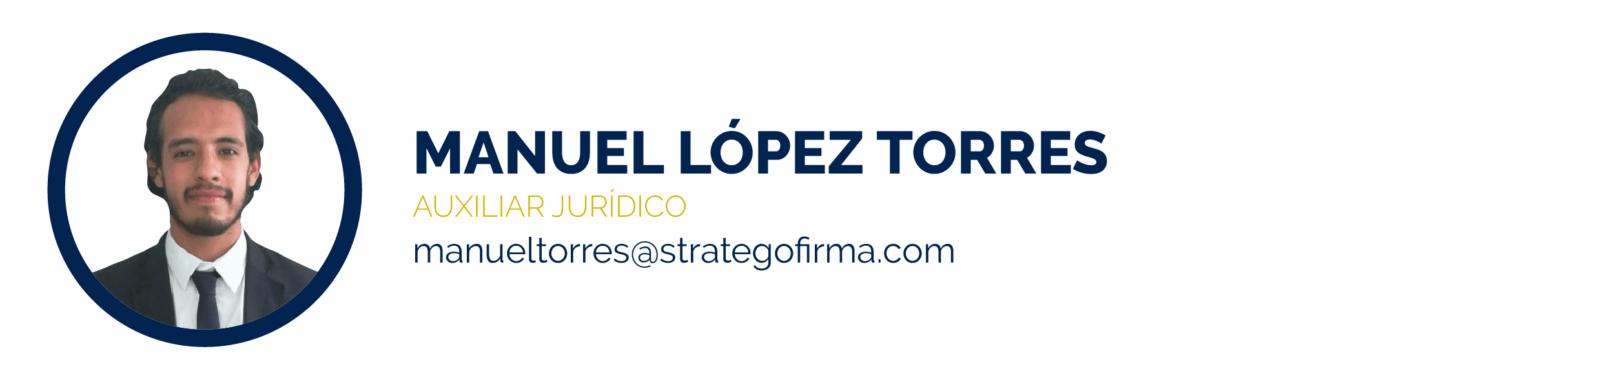 PERFIL_MANUEL-LOPEZ-TORRES.png